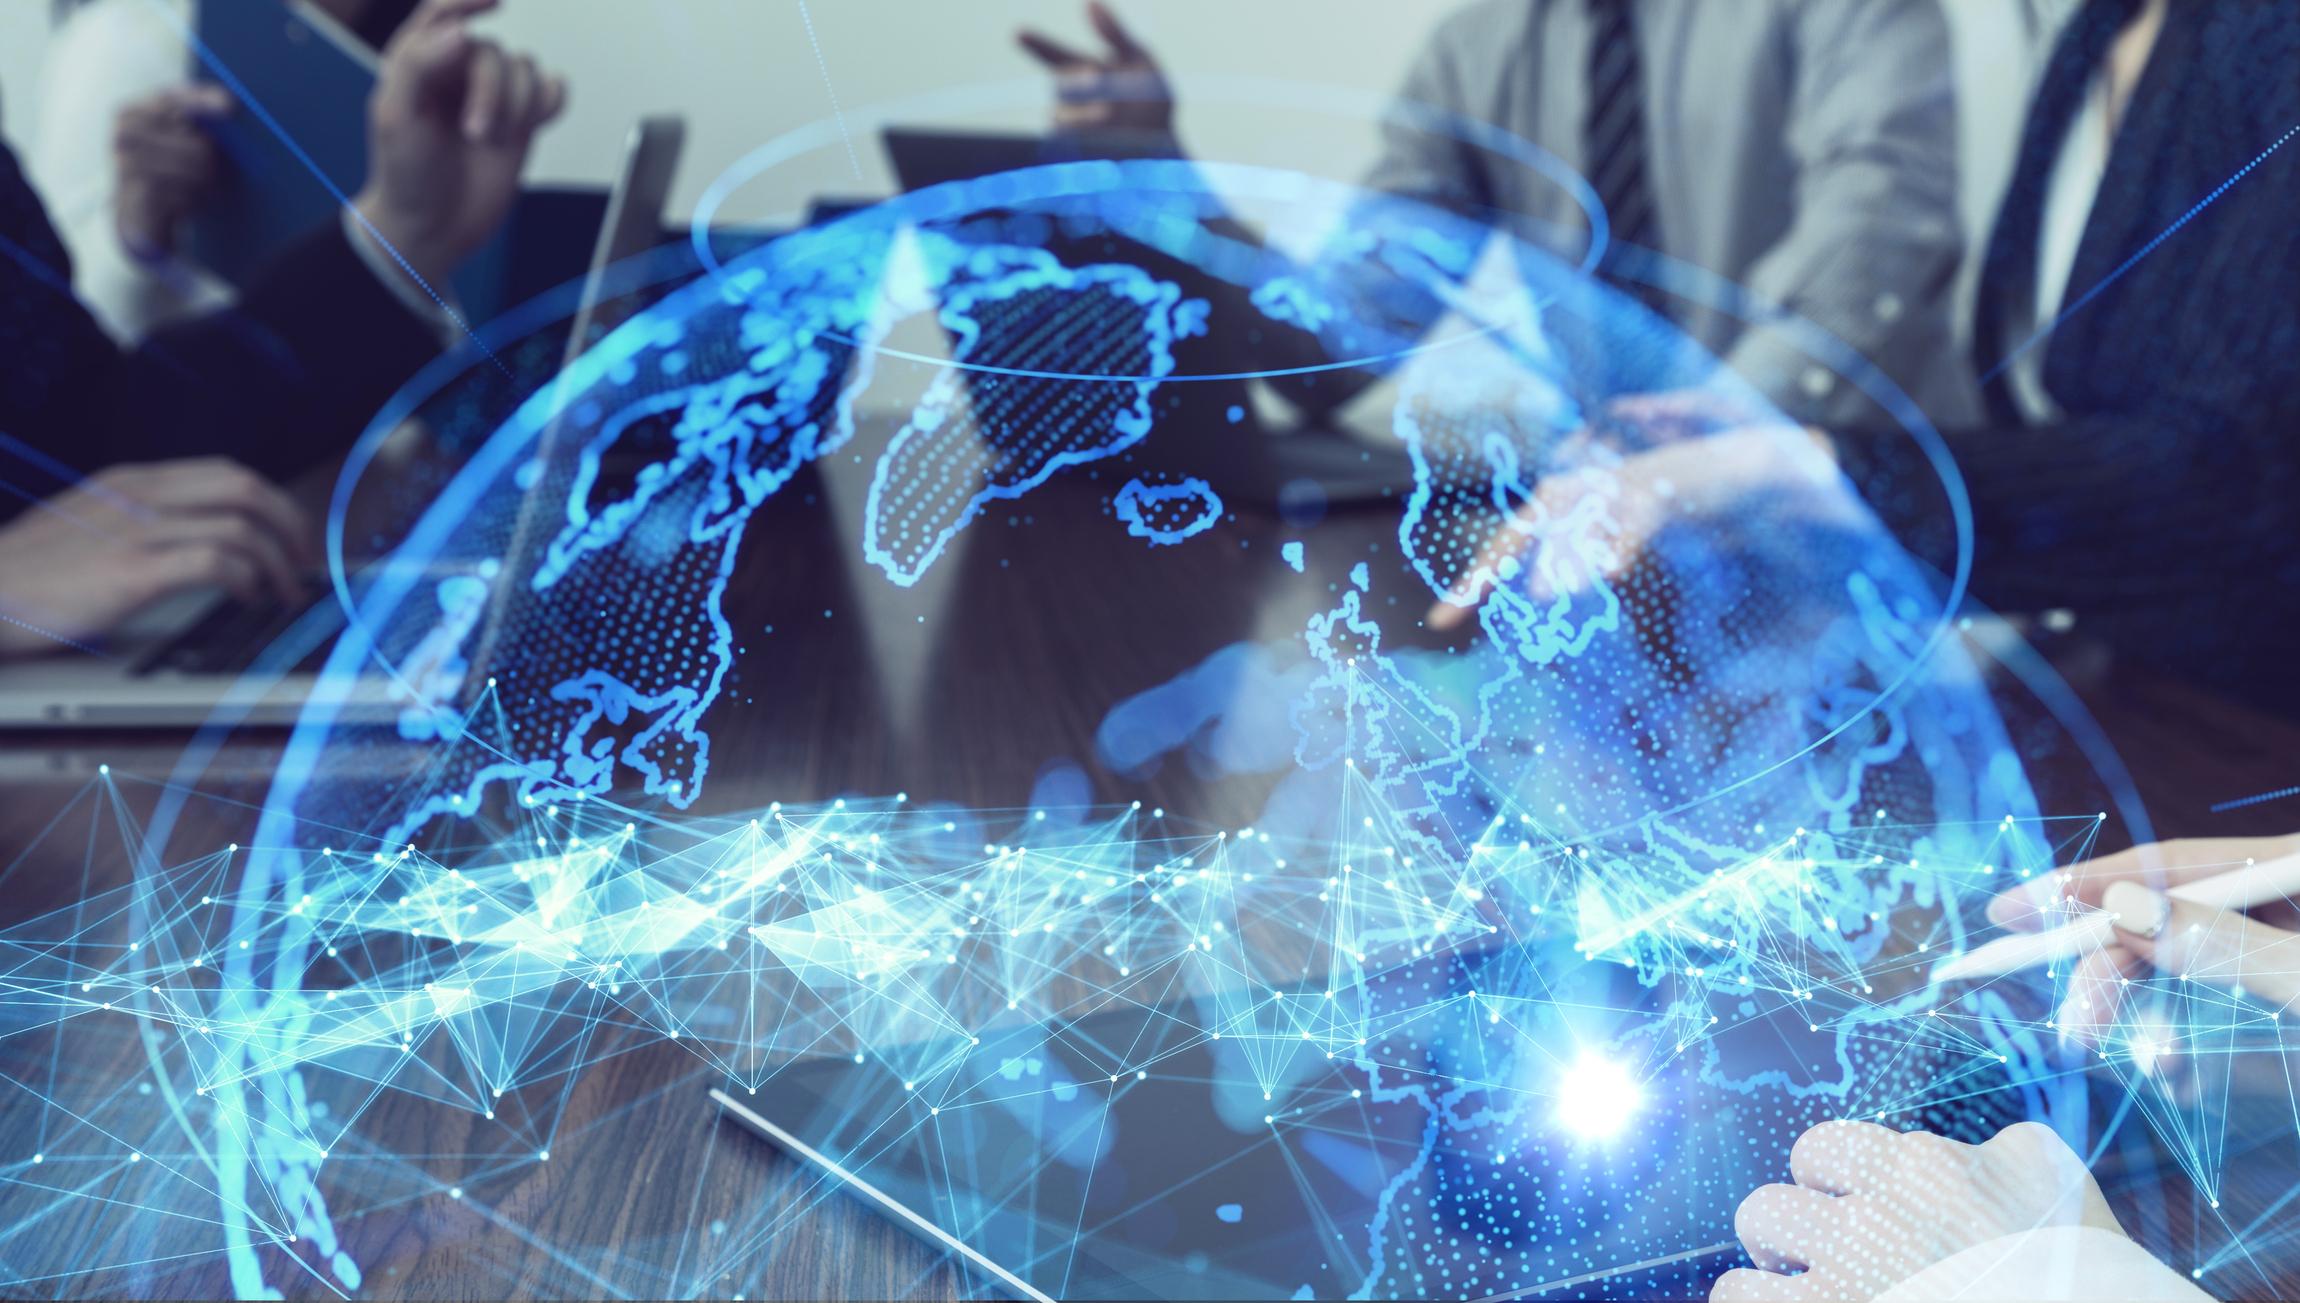 Global CIO survey